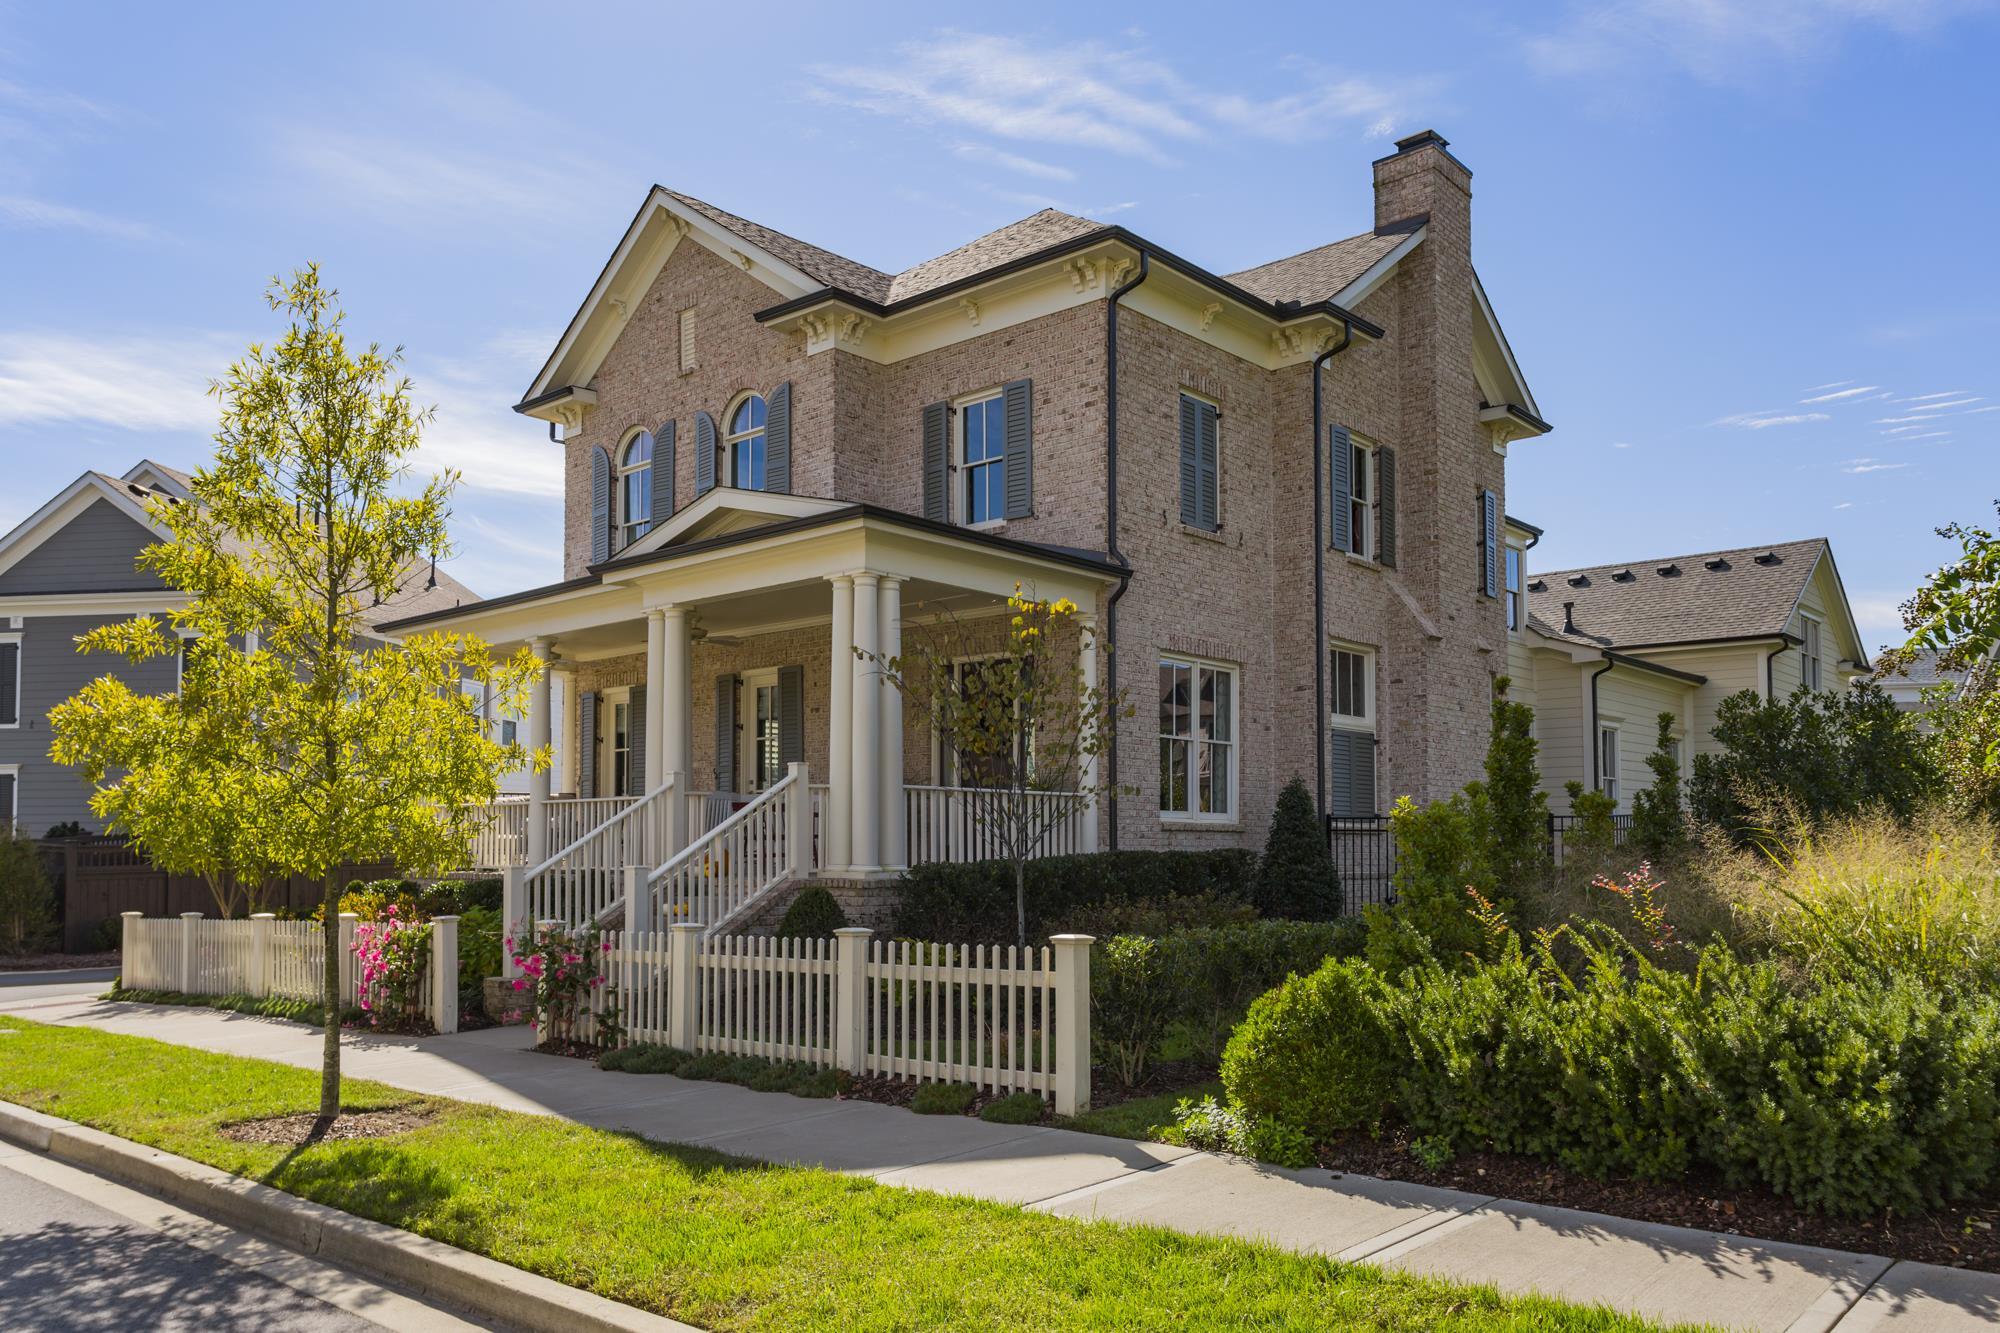 5024 Donovan, Franklin, TN 37064 - Franklin, TN real estate listing